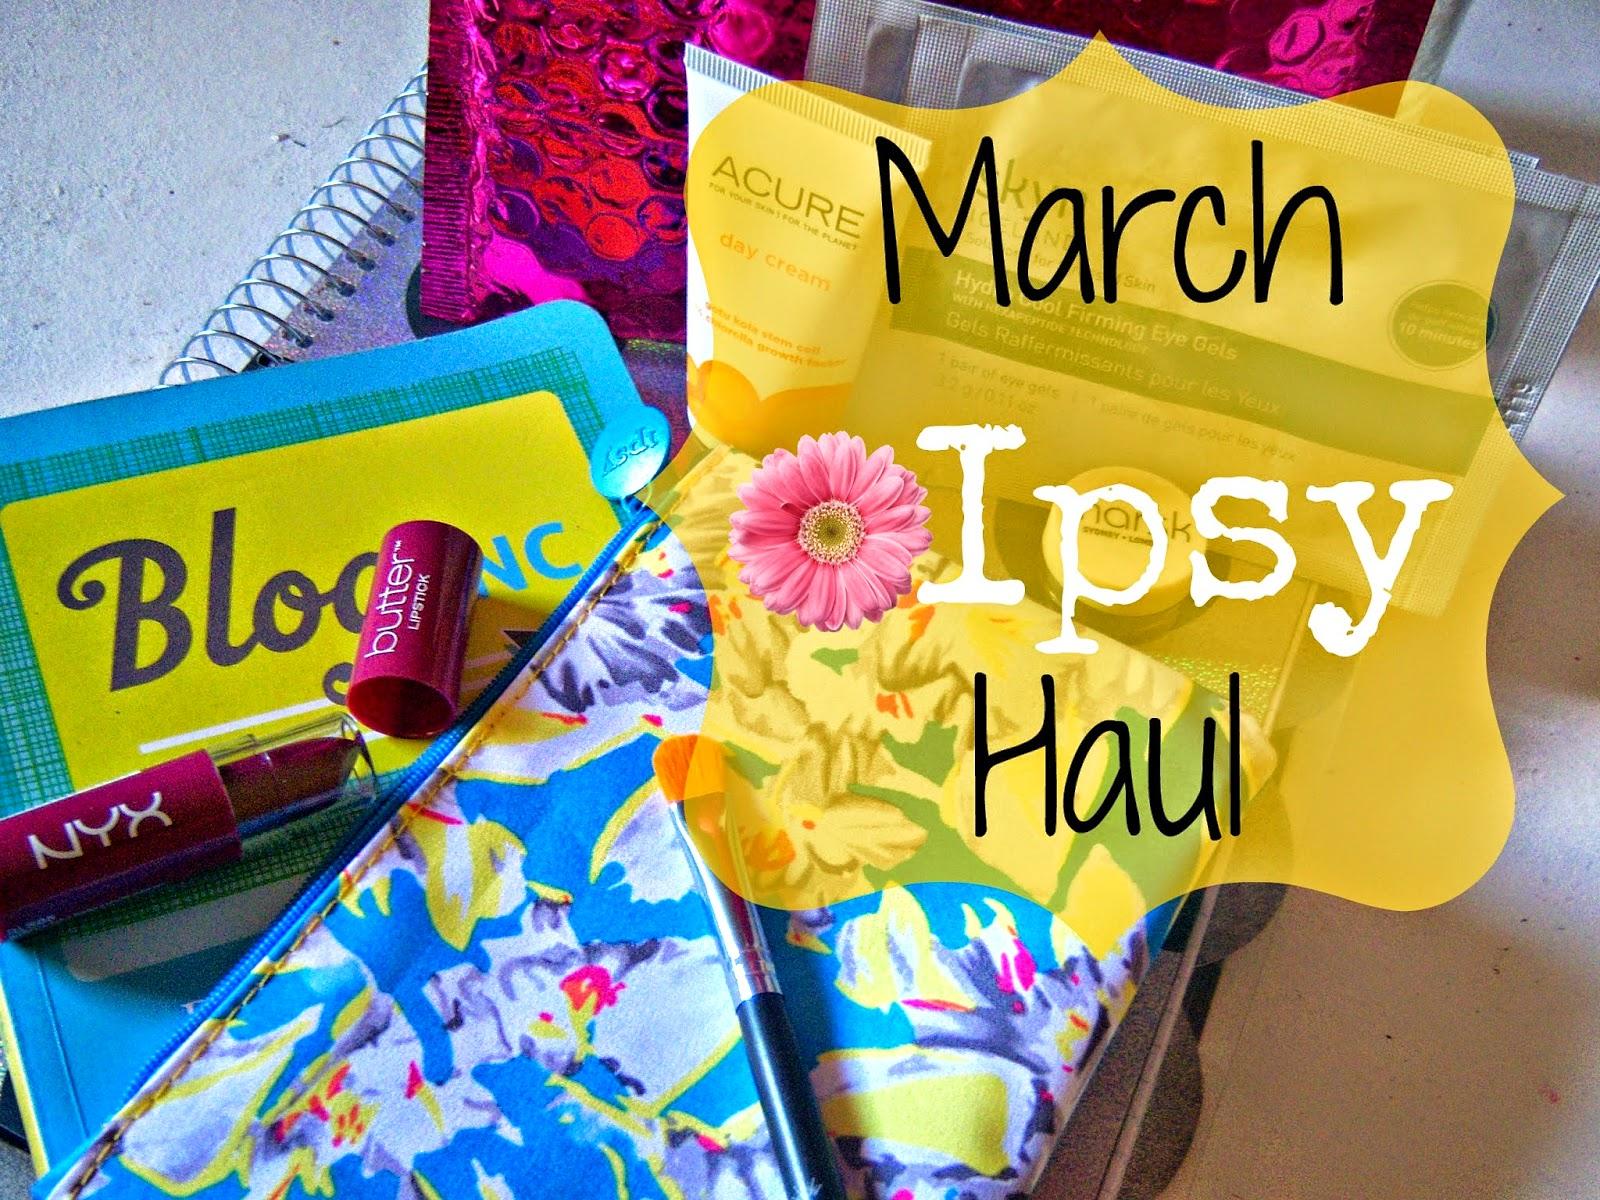 March 2015 Ipsy Haul